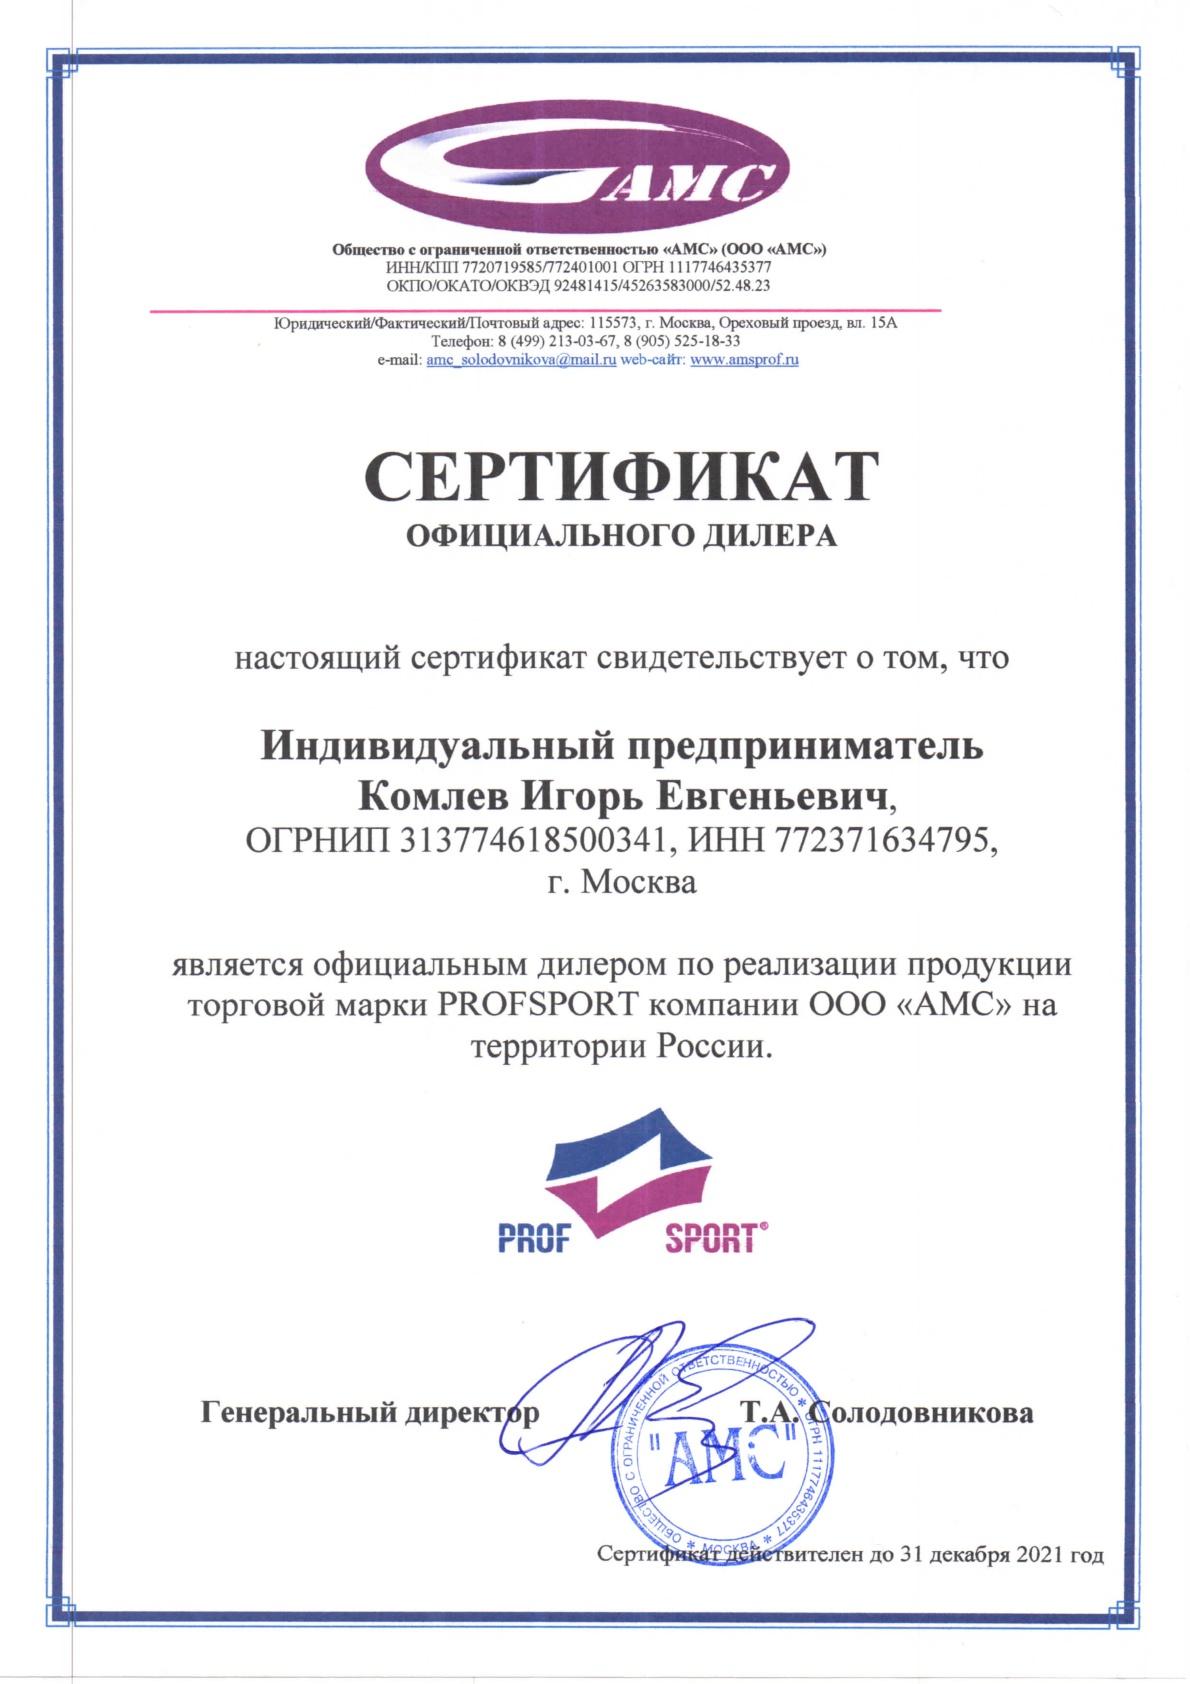 Сертификат_дилера_Профспорт.jpg